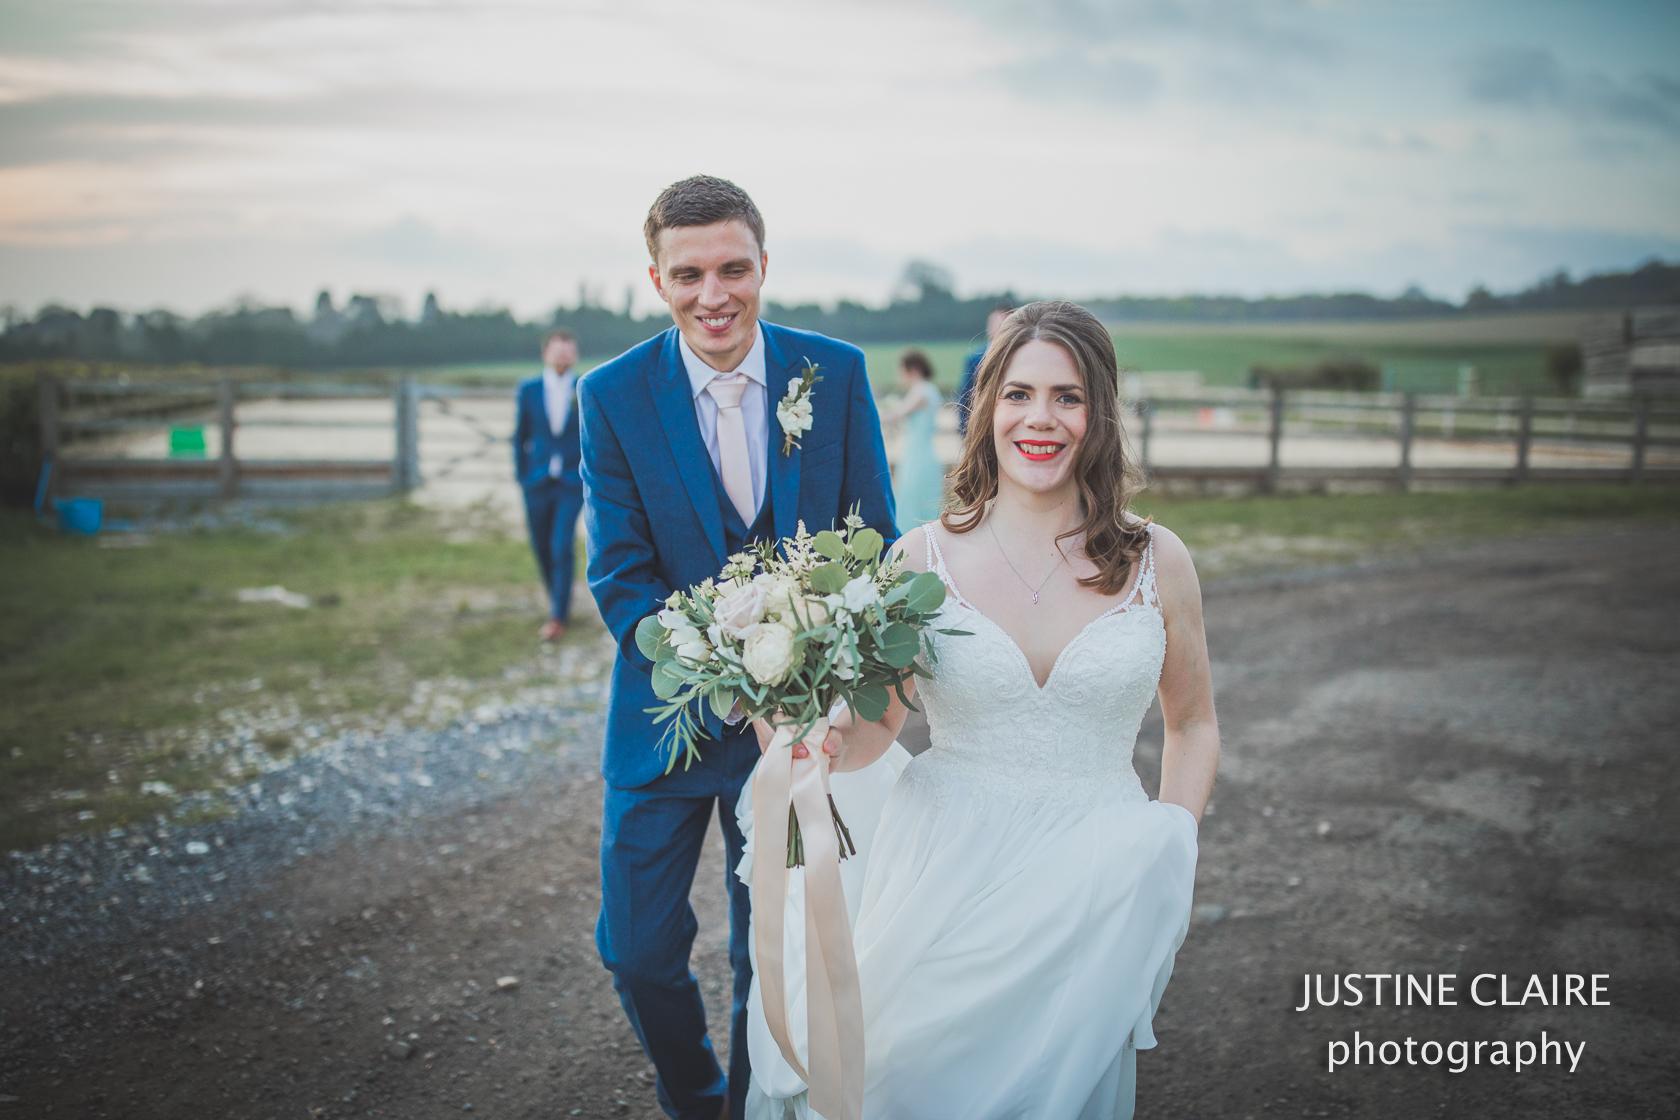 Fitzleroi Fittleworth petworth Billingshurst farm Wedding Photography by Justine Claire photographer Arundel Worthing Brighton-64.jpg